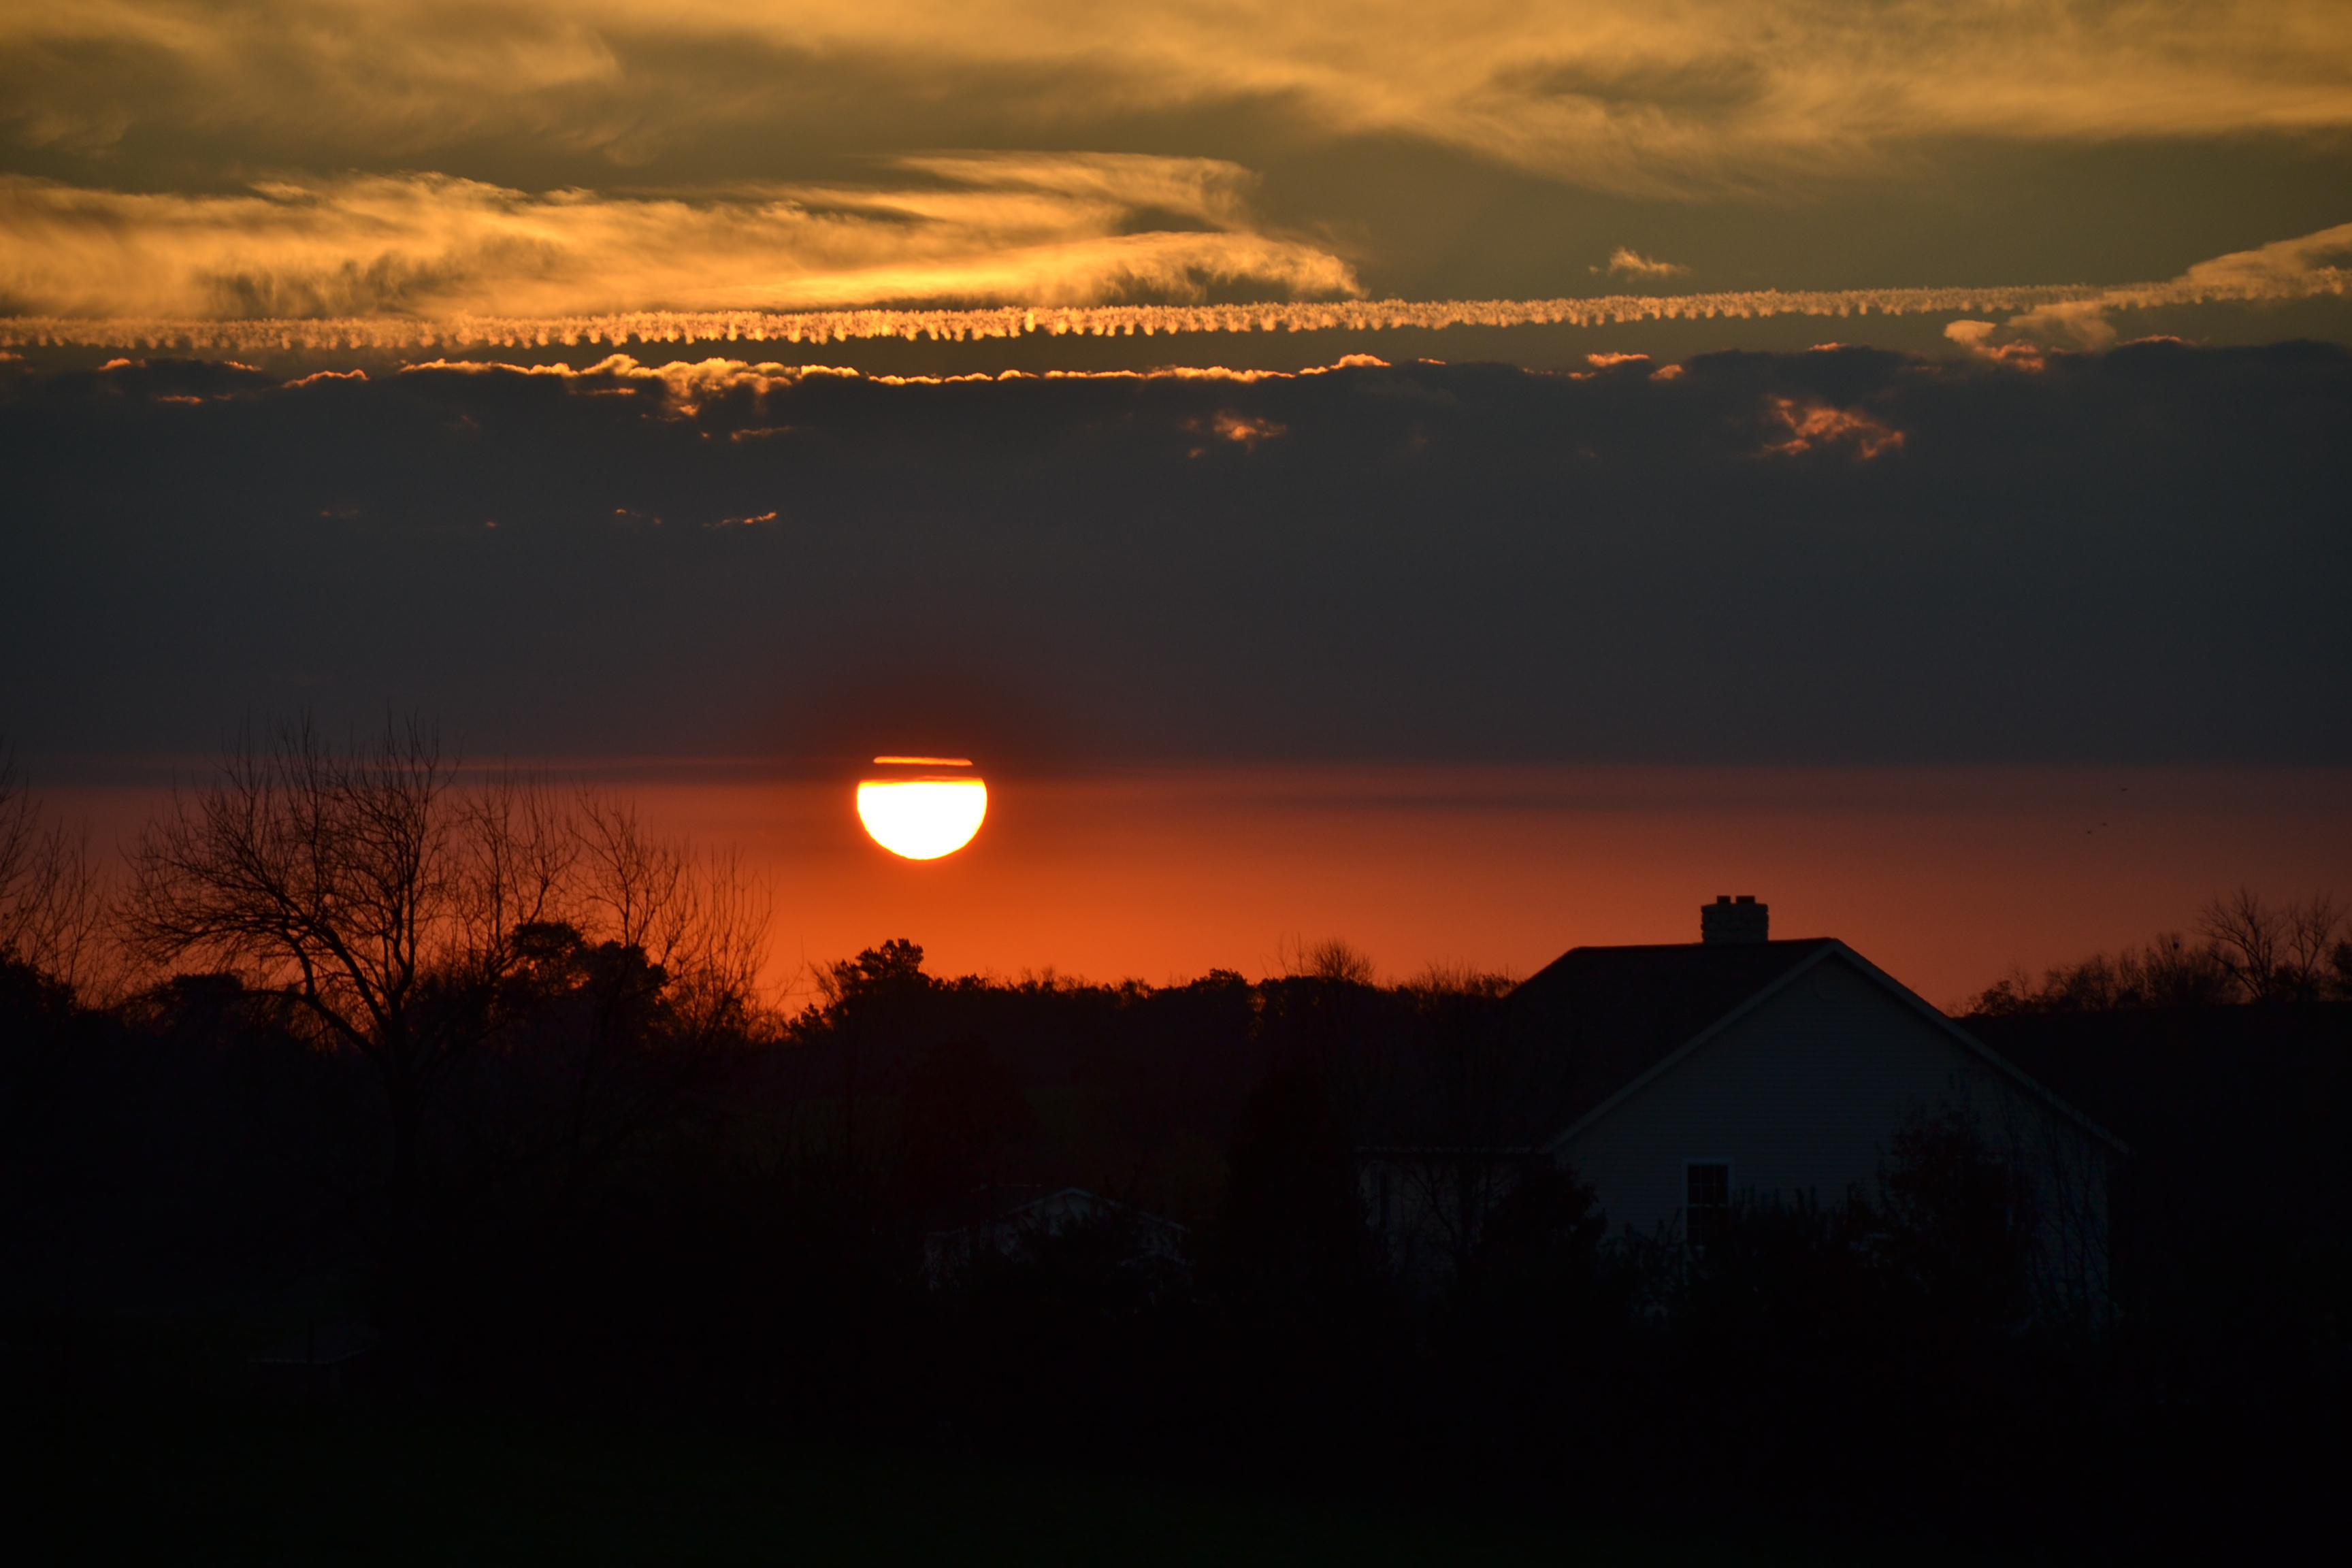 Sunrise by Bruce Stambaugh